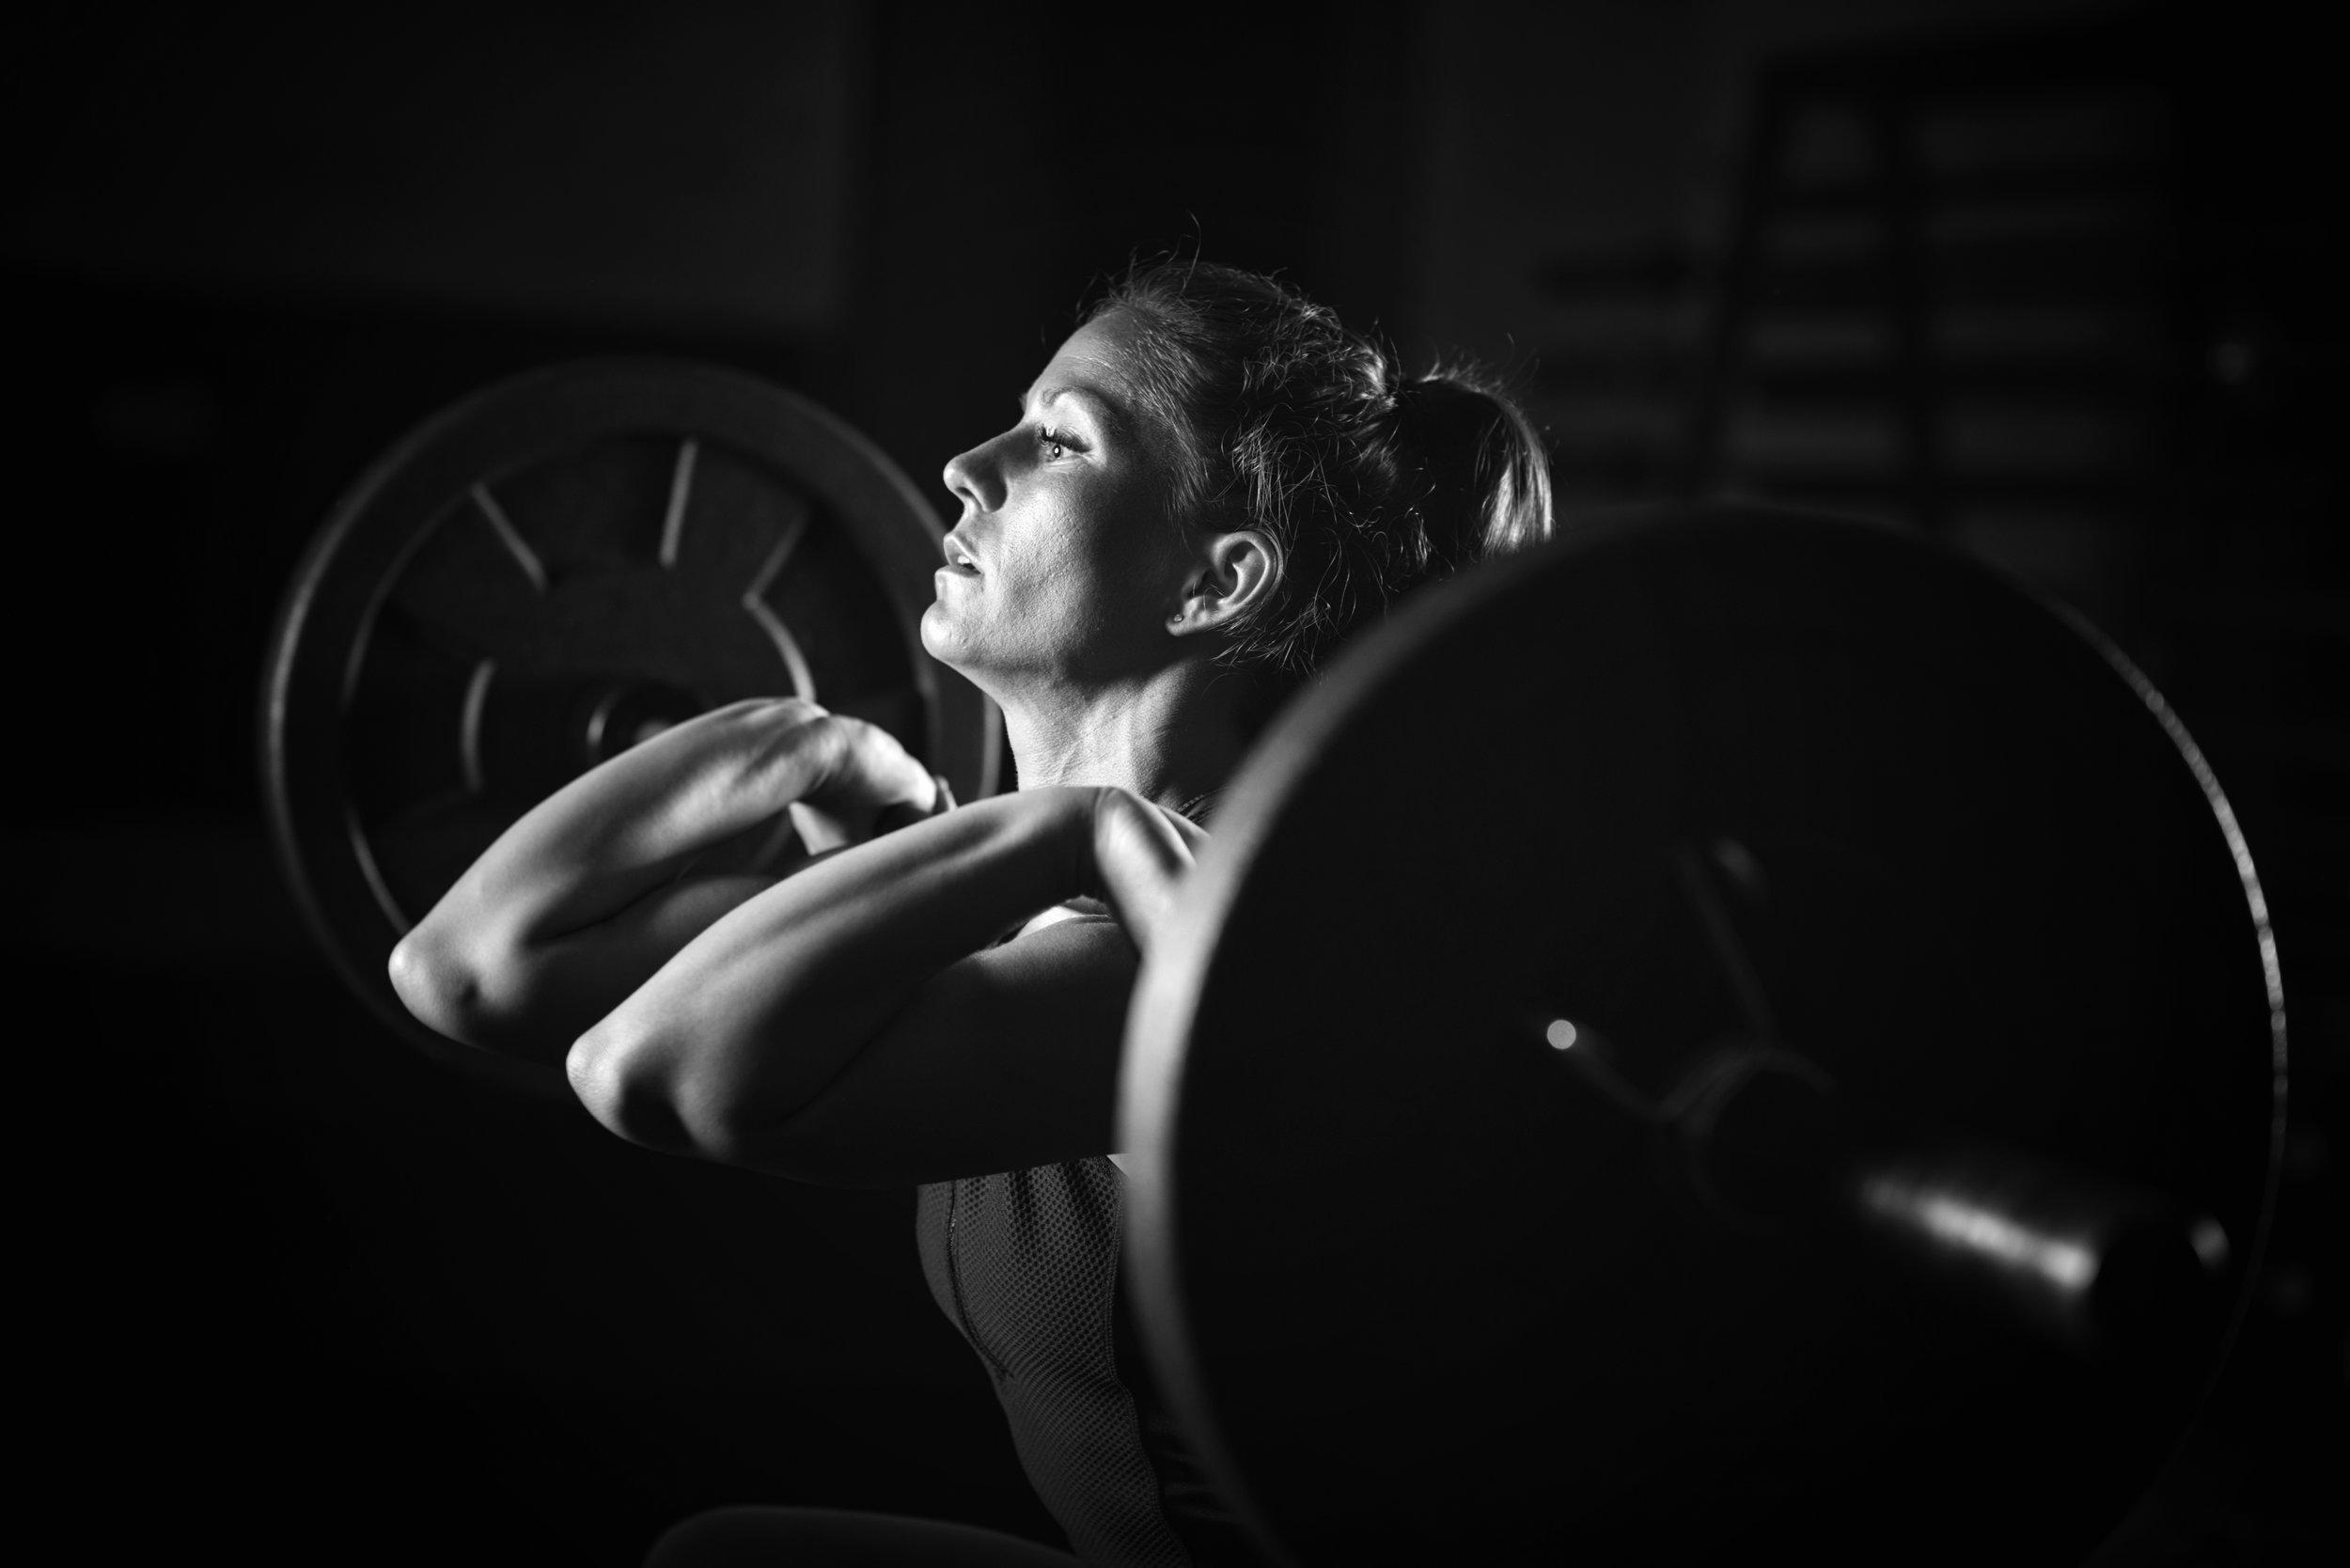 woman-weightlifting-on-training-P93XX2S.jpg